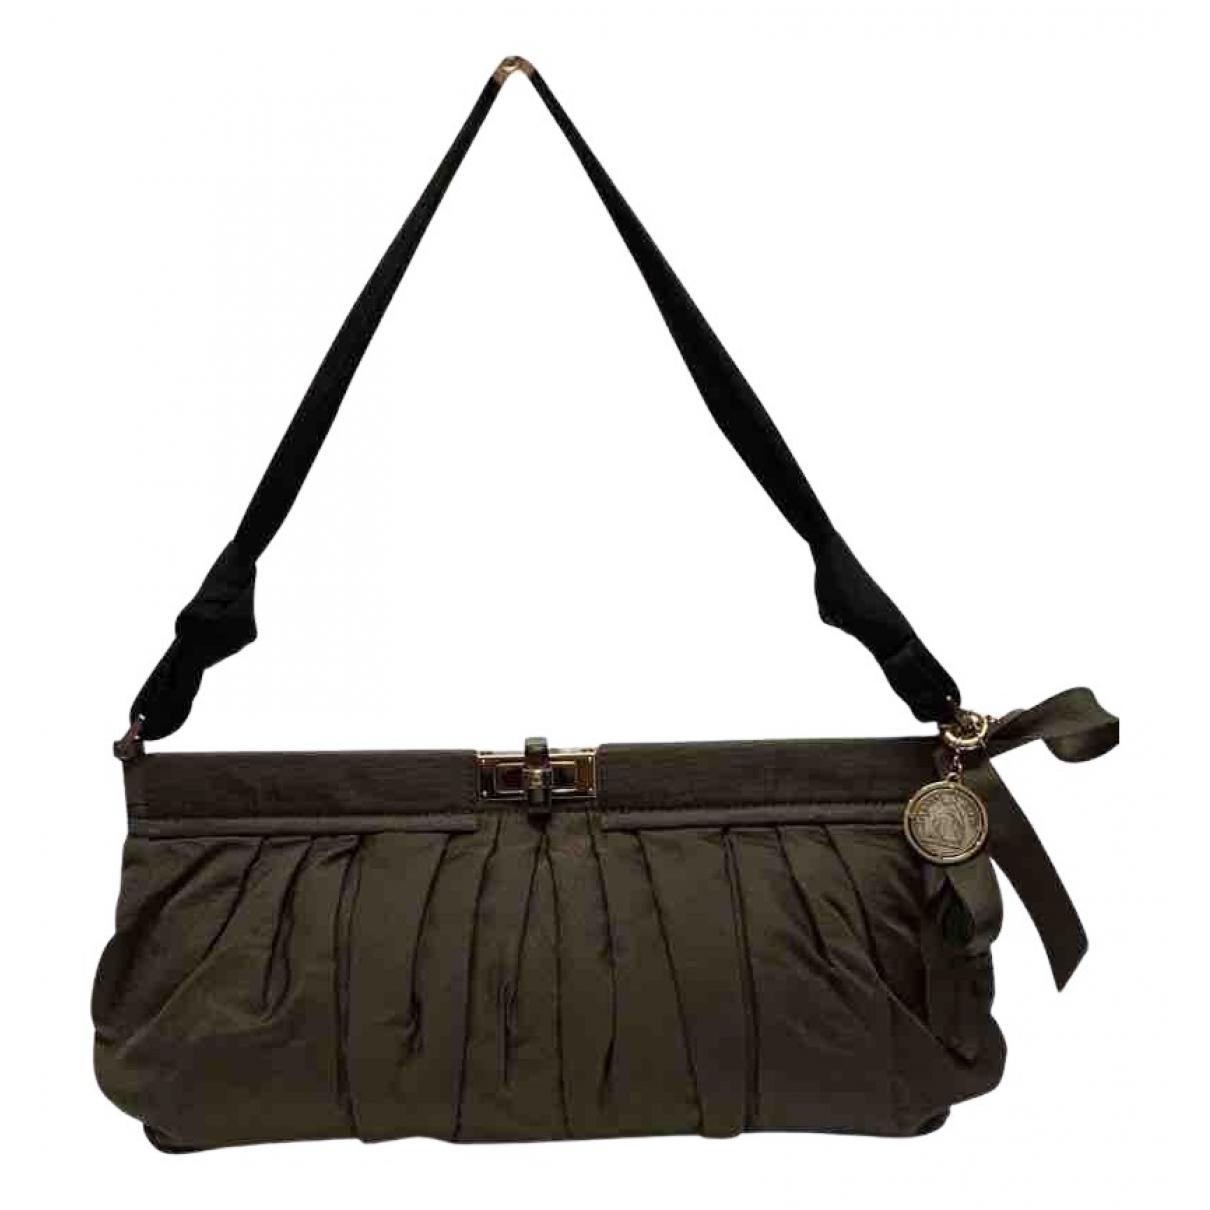 Lanvin N Brown Cloth handbag for Women N